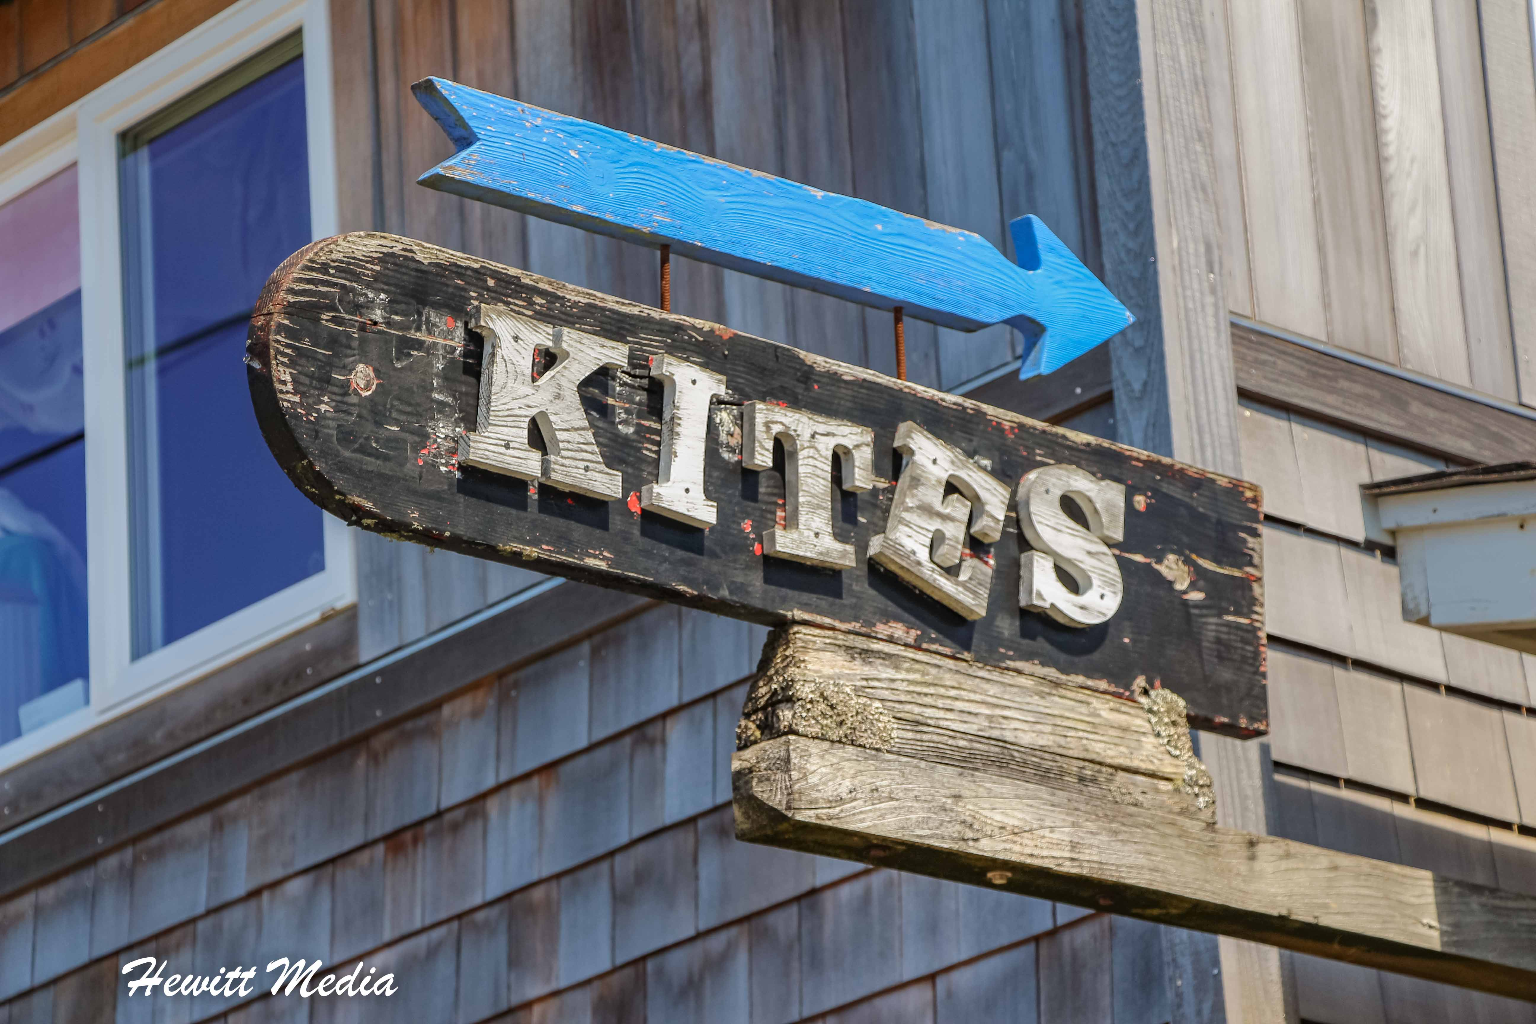 A unique kite shop in downtown Canon Beach